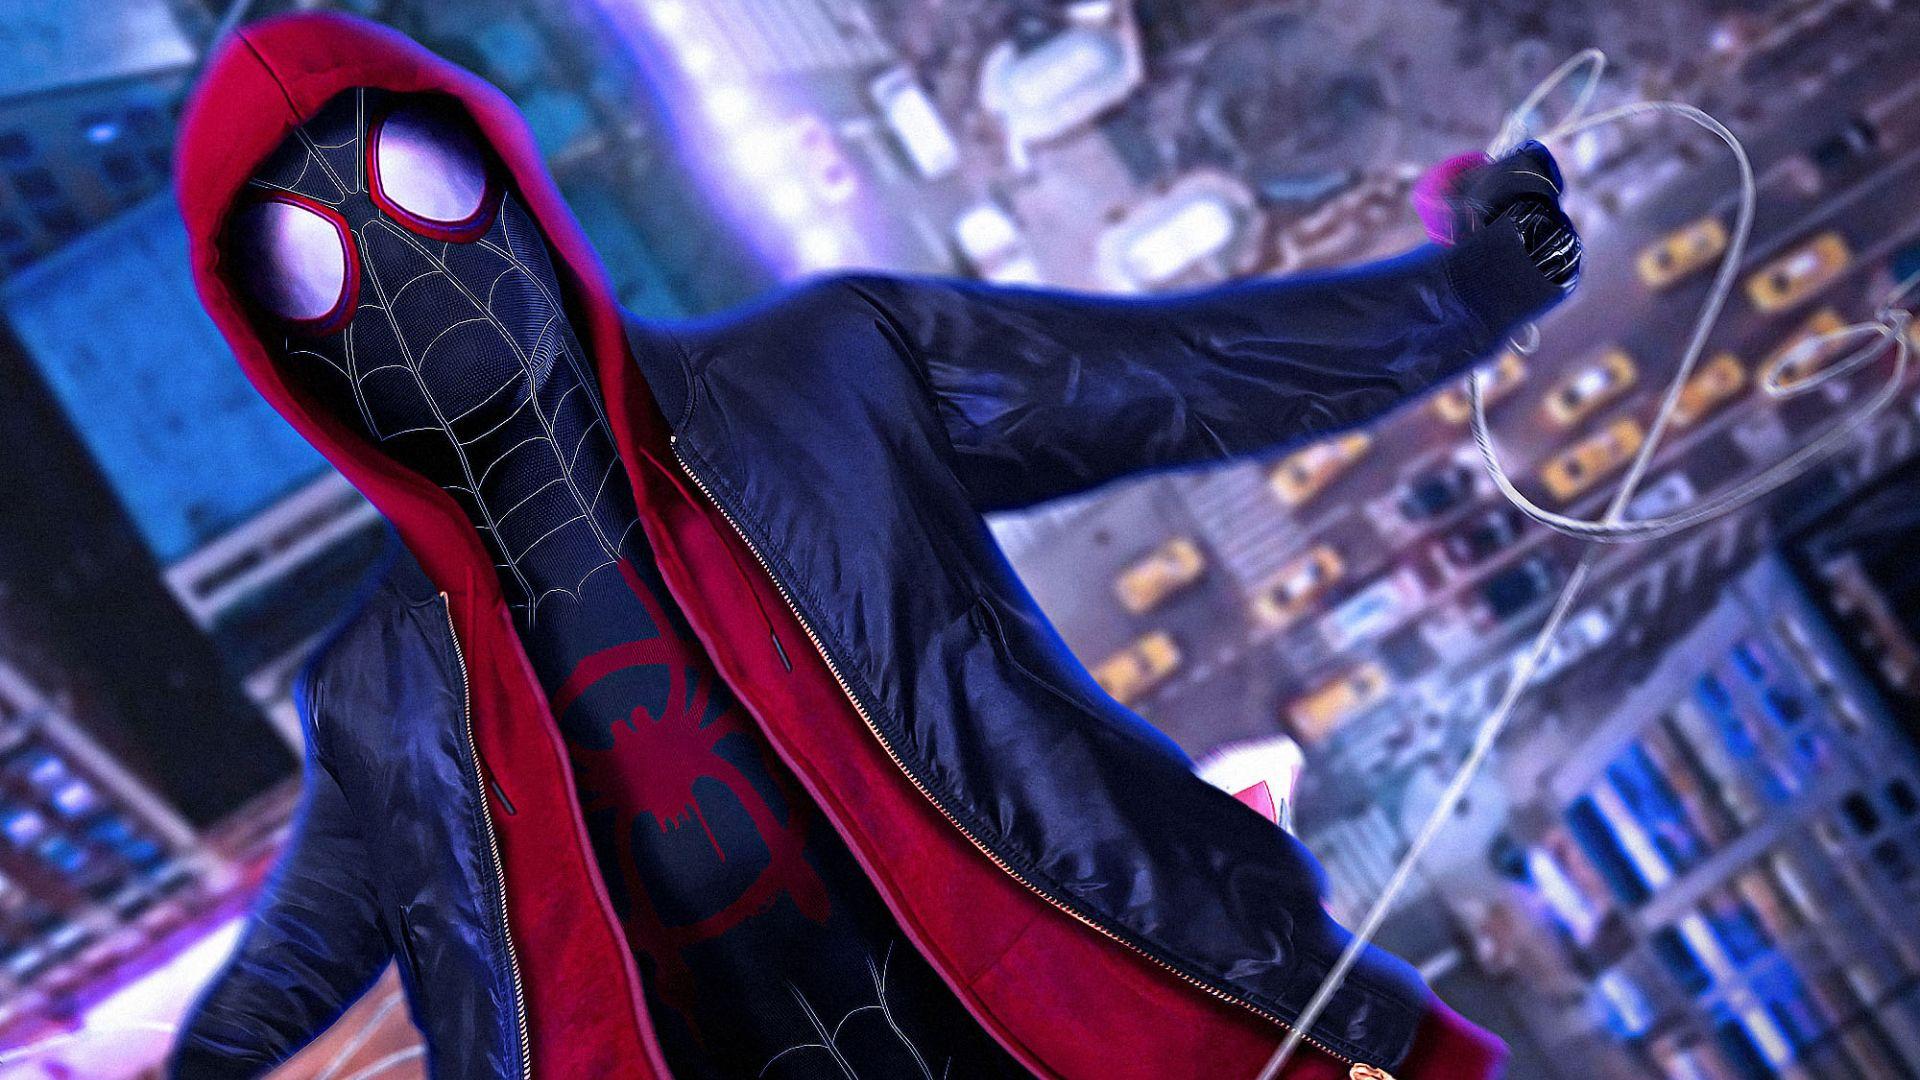 2048x2048 The Incredibles 2 Movie 2018 Ipad Air Hd 4k: Desktop Wallpaper Spider Man: Into The Spider Verse, Movie